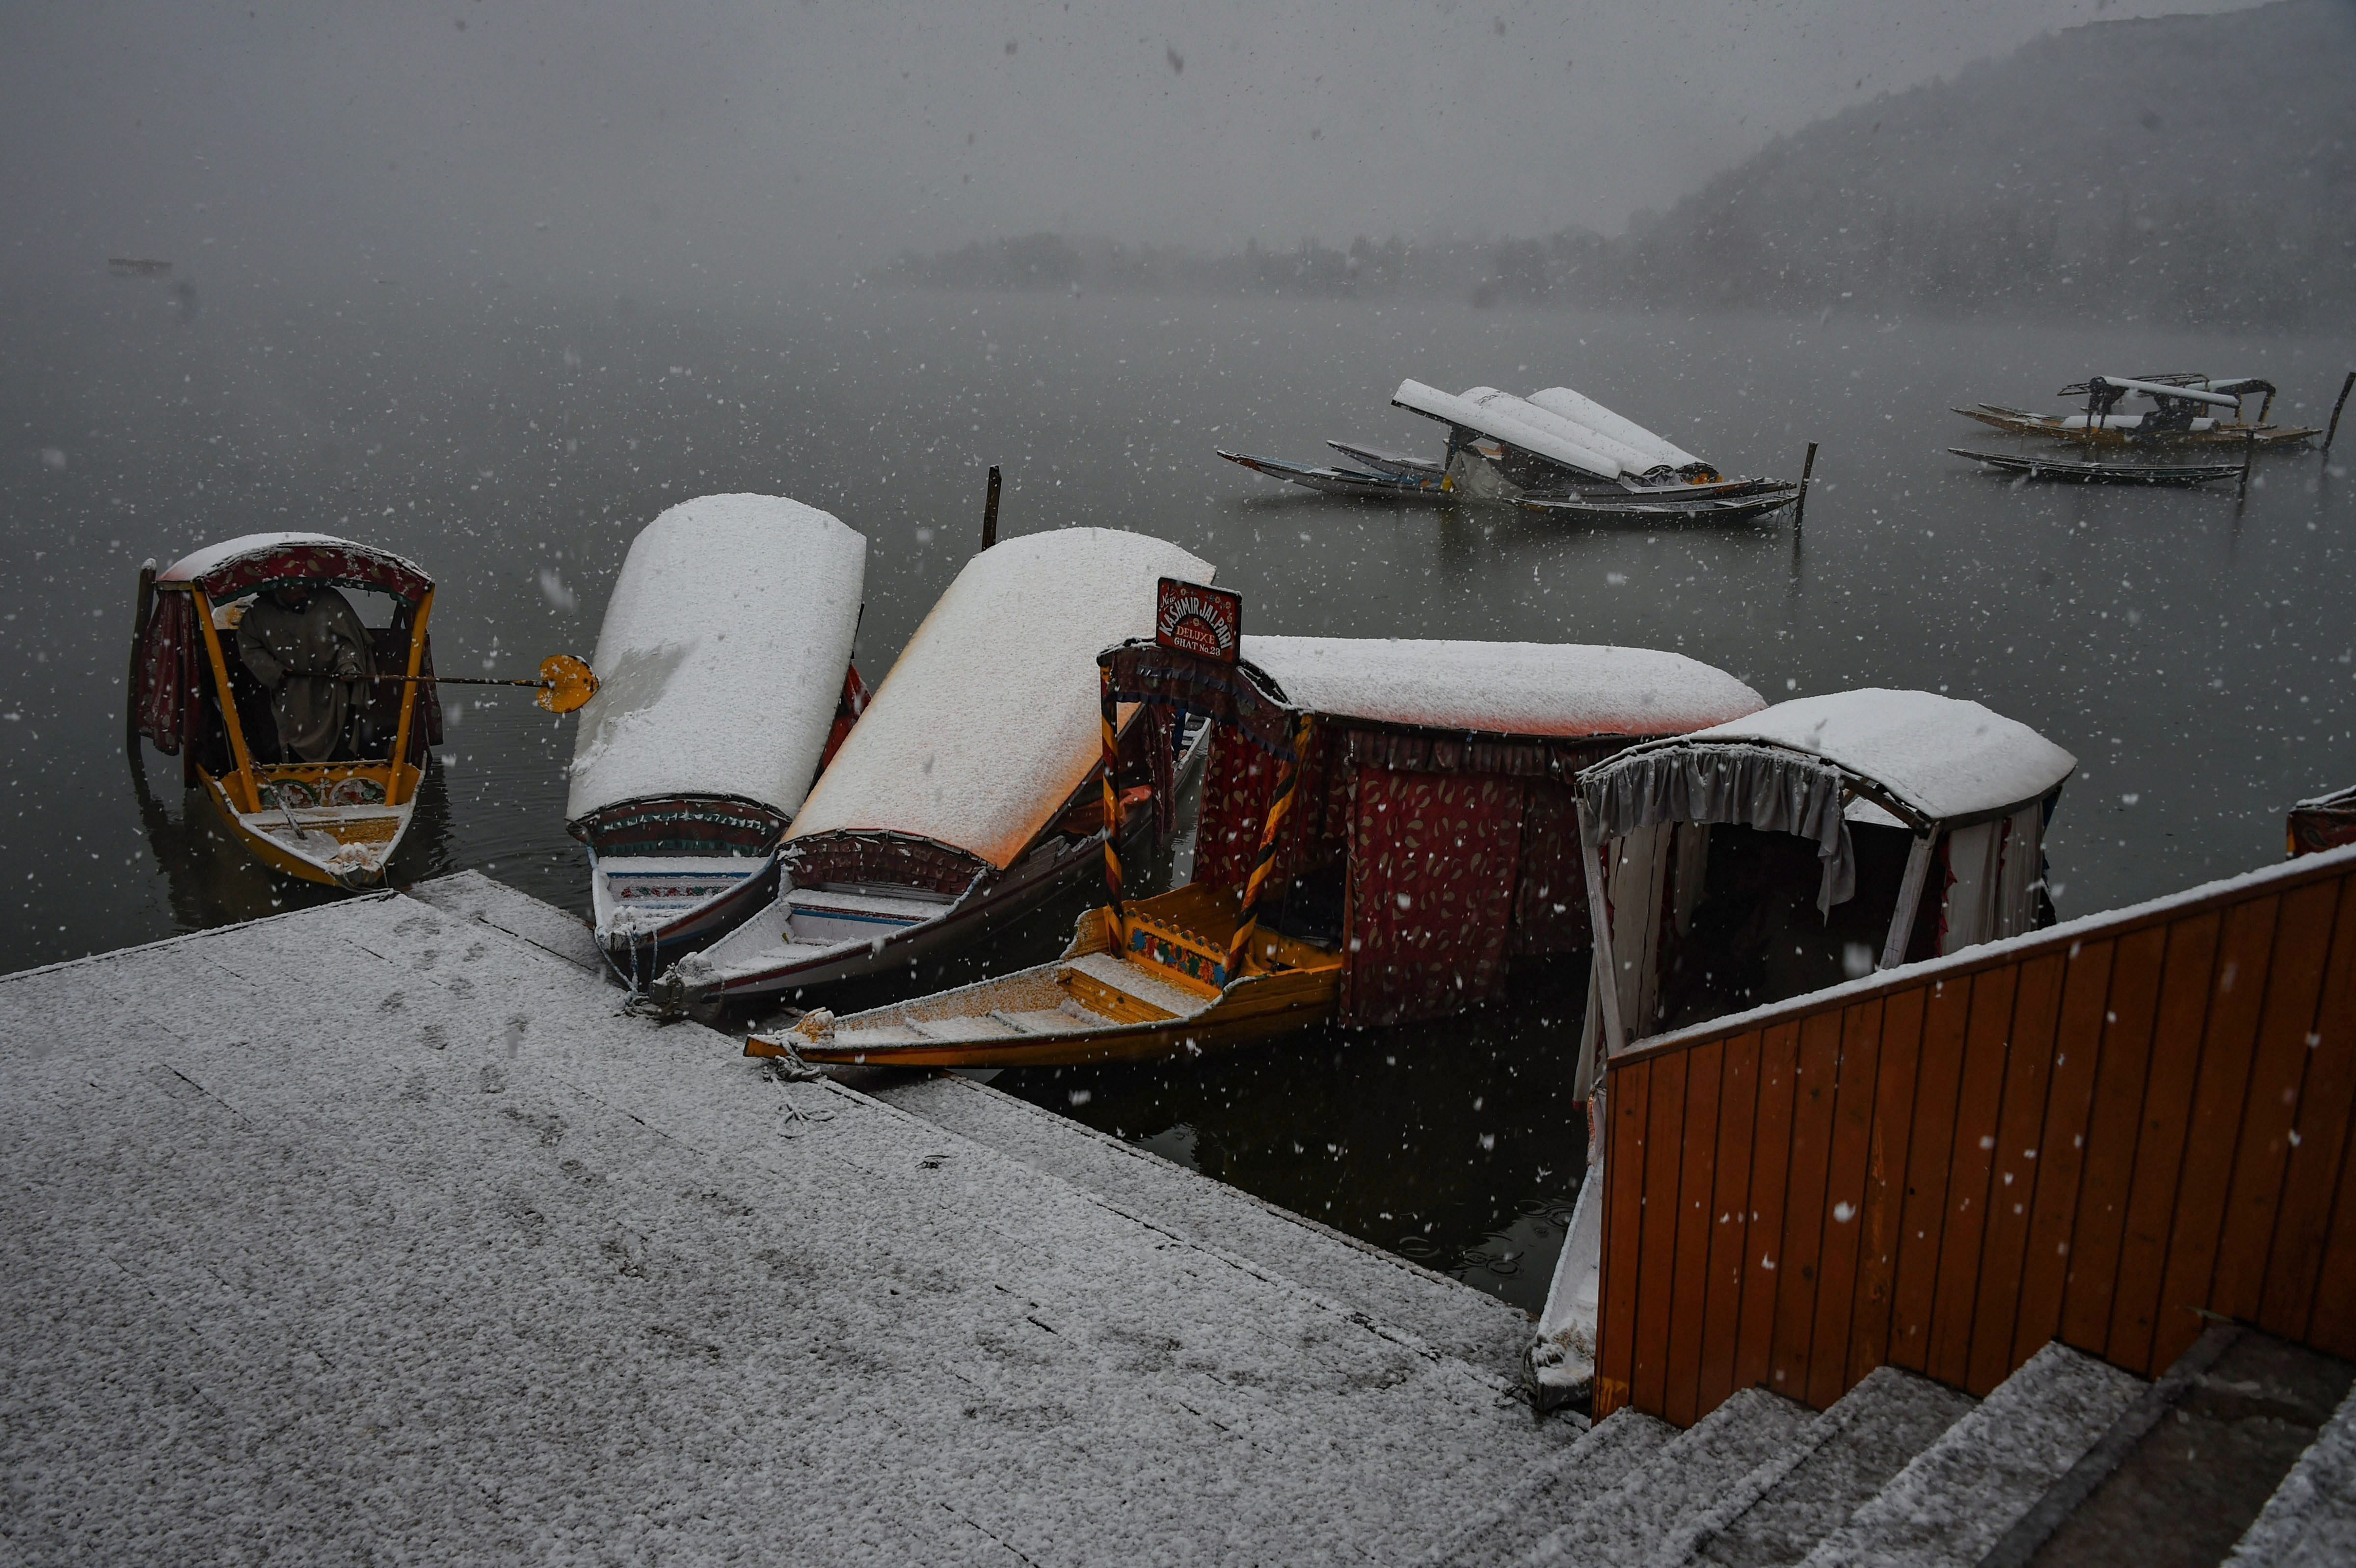 Shikaras covered in snow in Srinagar.